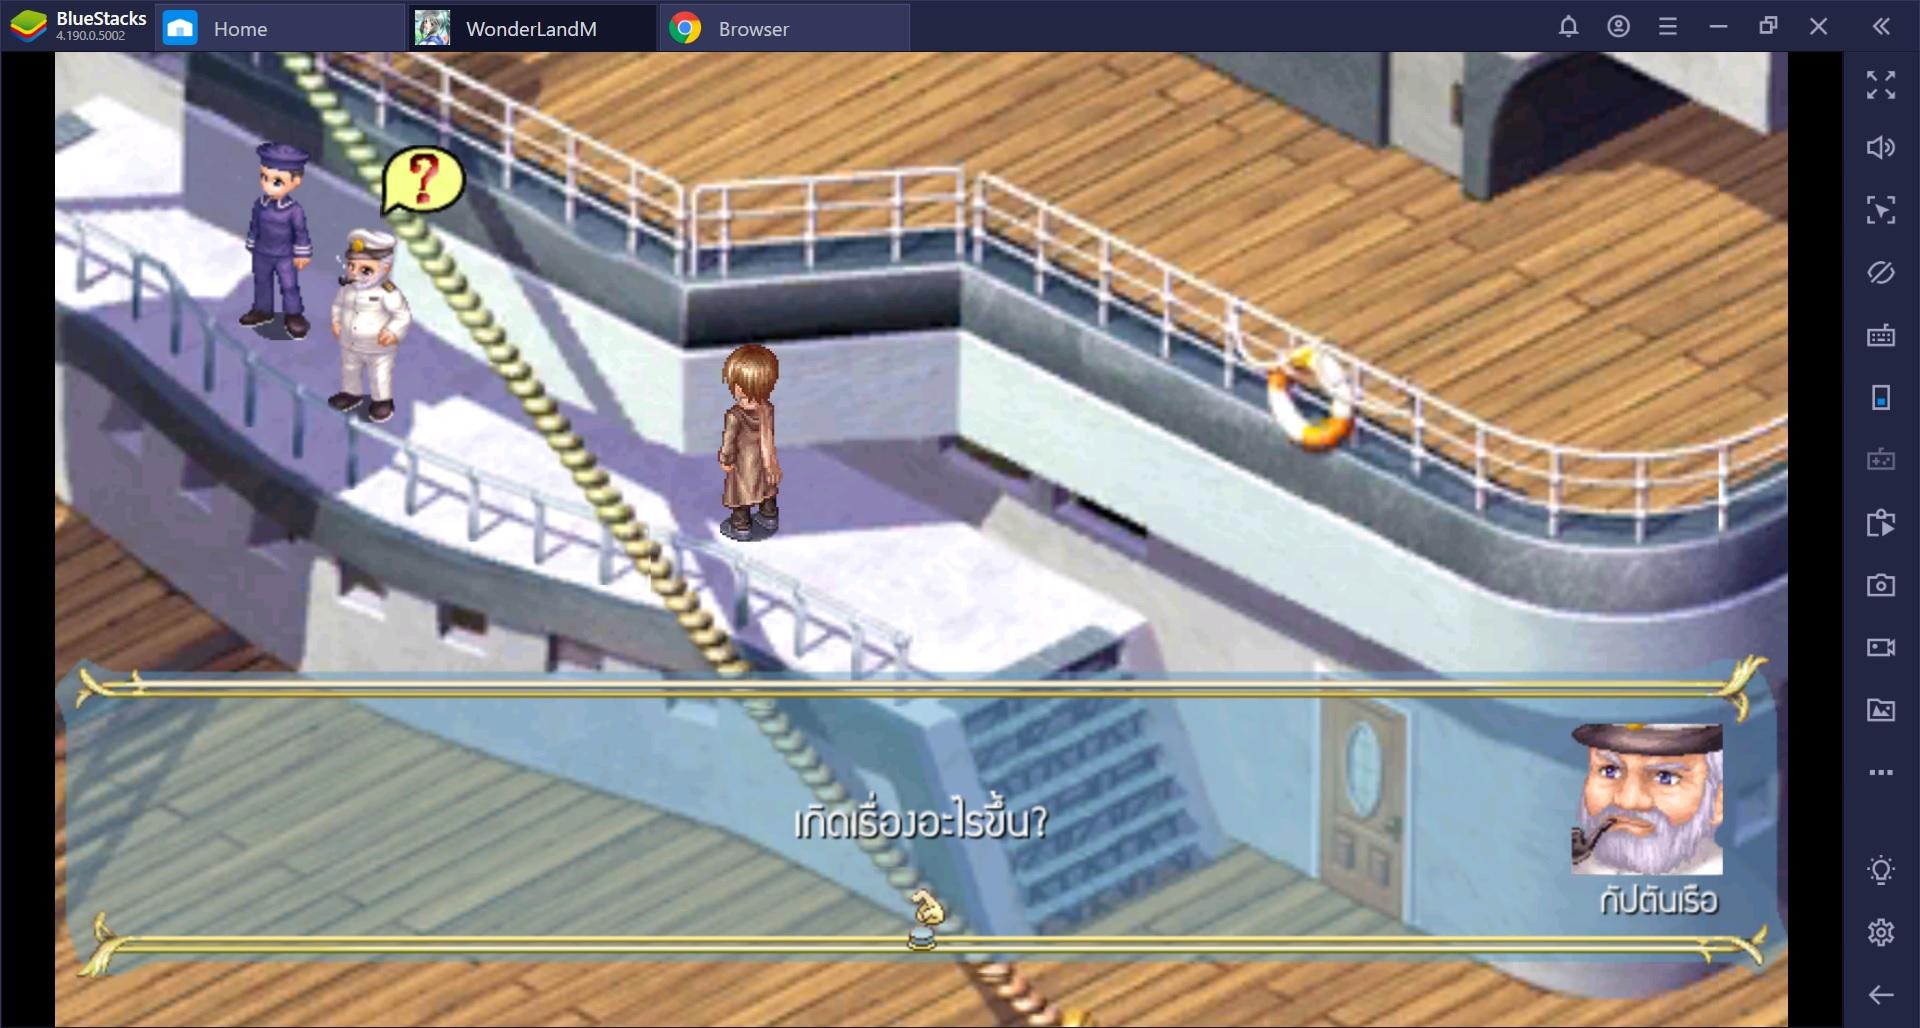 Wonderland Online Mobile Online แนะนำค่า Status ในเกมเล่นง่ายๆ ไม่ยาก